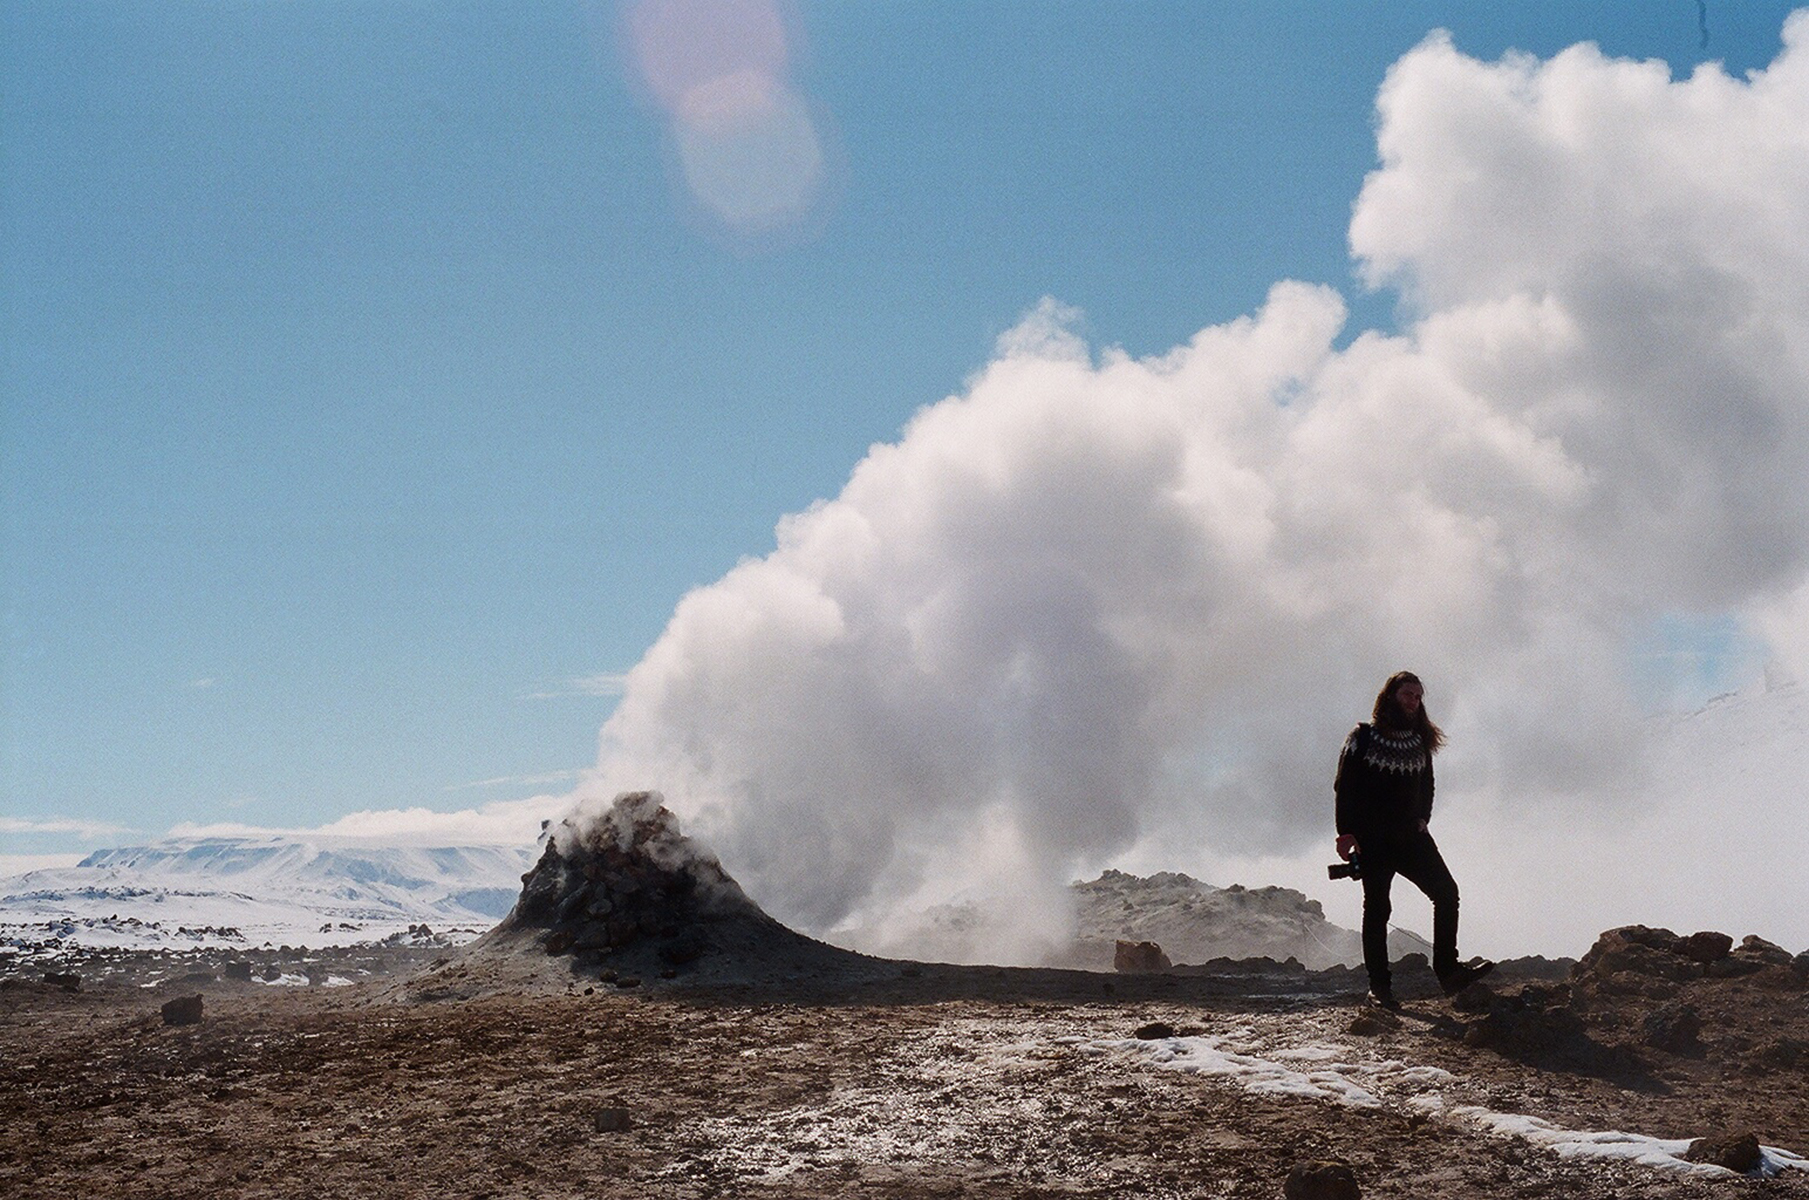 Talia Ricci, Planet Iceland, 2016